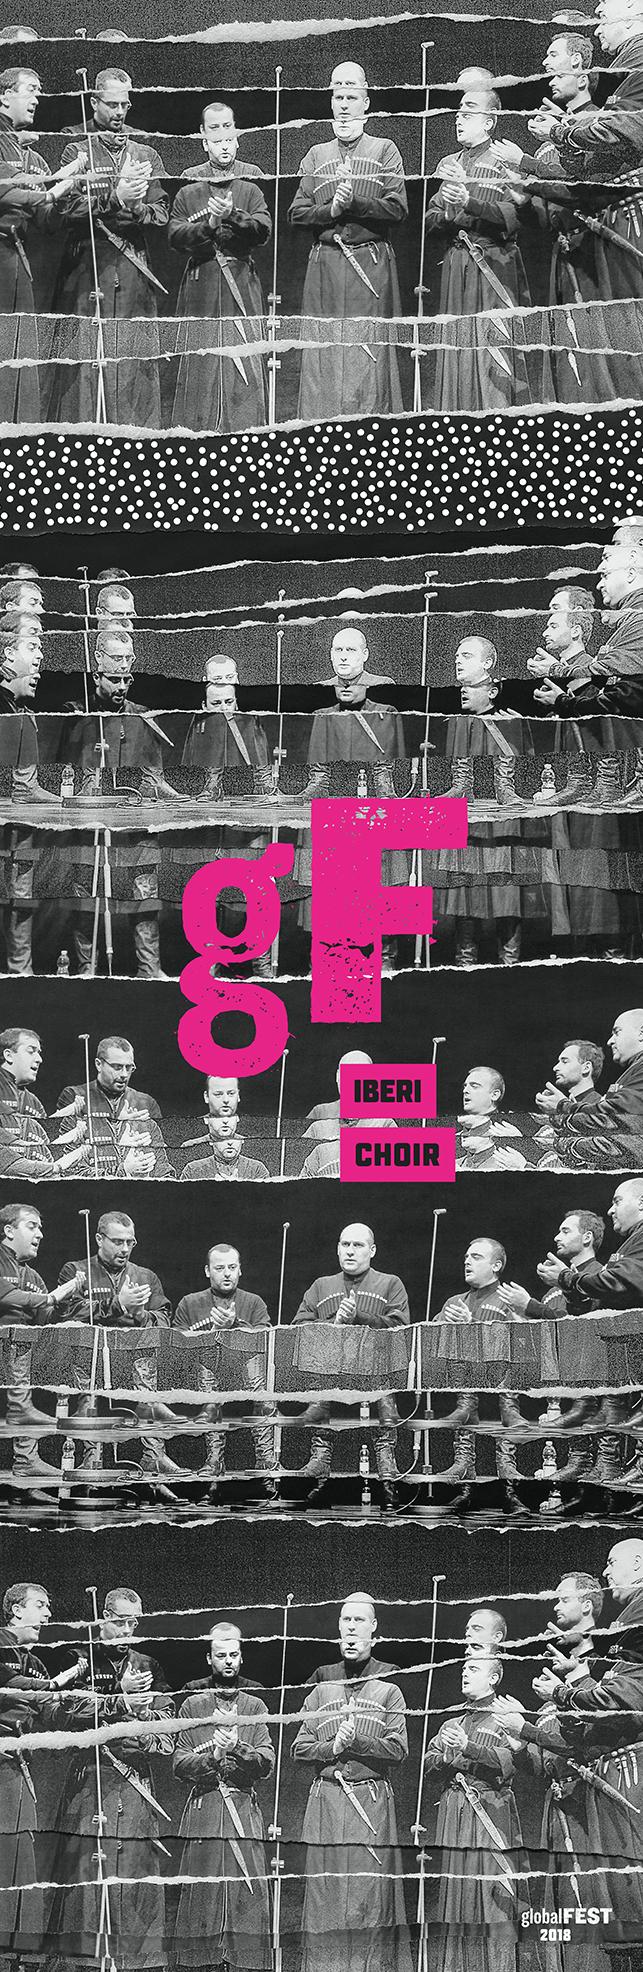 diogomontes_globalfest_artist_posters-iberi